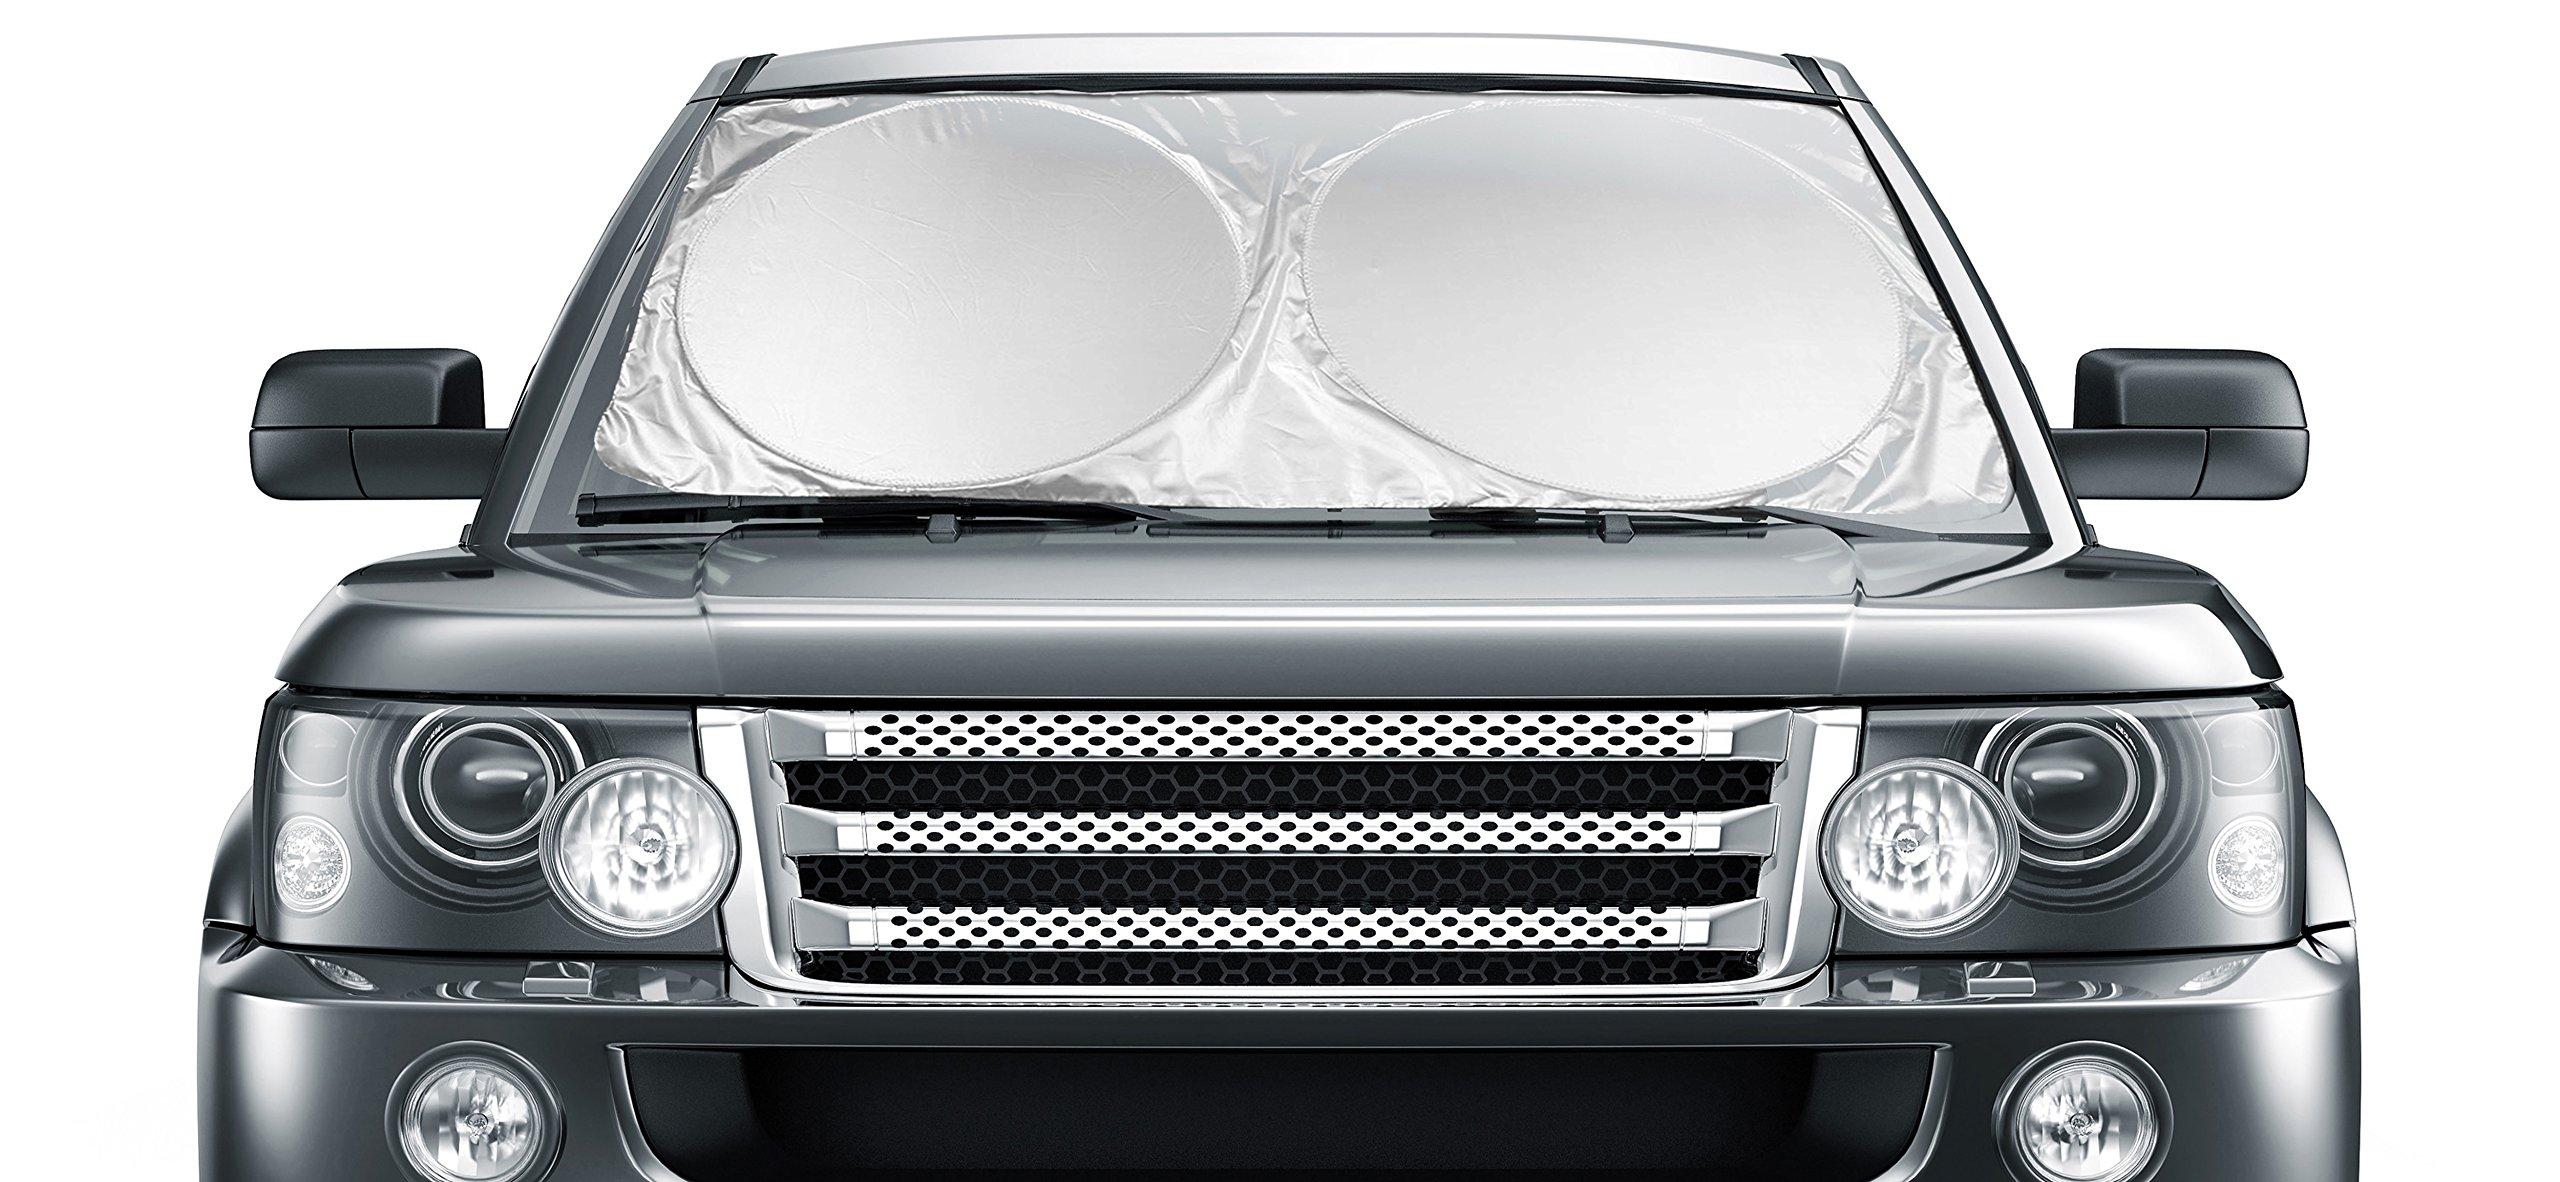 Car Windshield Sunshade Jumbo 63 X 35 For Truck Http Wwwlandroverlightweightcodiagramjpg Suv Uv Protector Shields Auto Keeps Vehicle Cooler Easy To Use Large Pop Up Sun